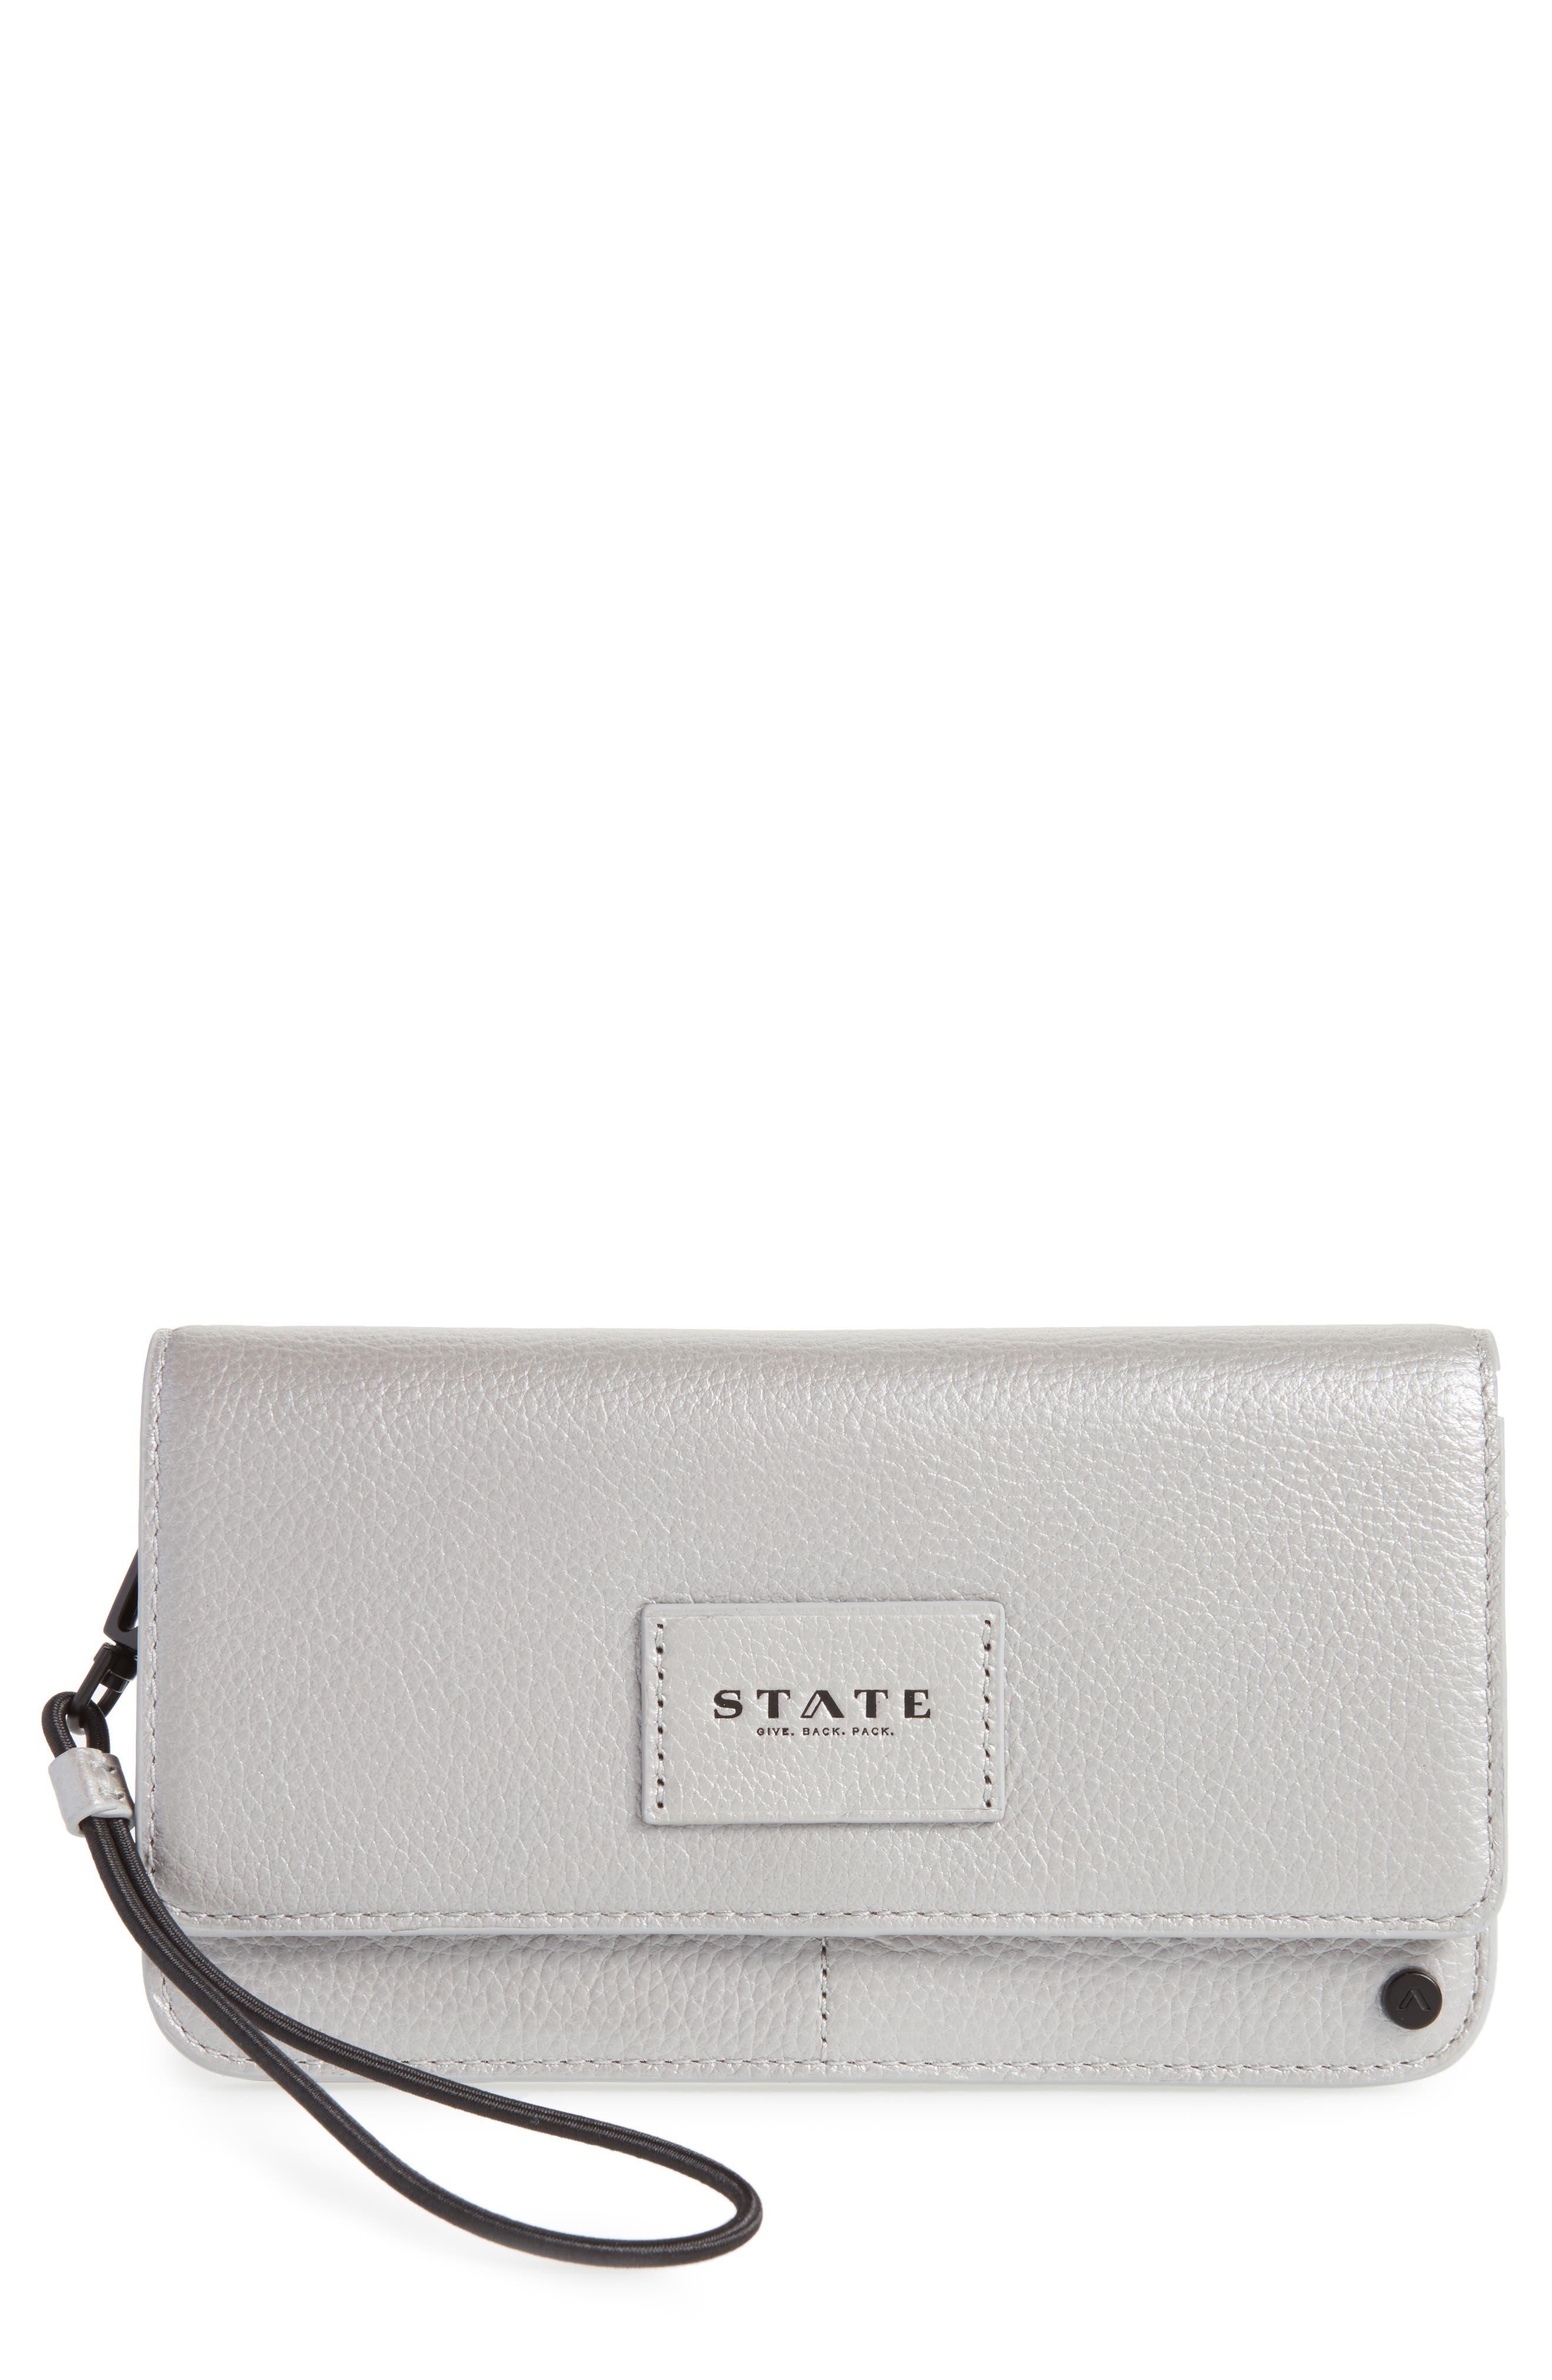 Main Image - STATE Bags Greenwood Bristol Leather Wristlet